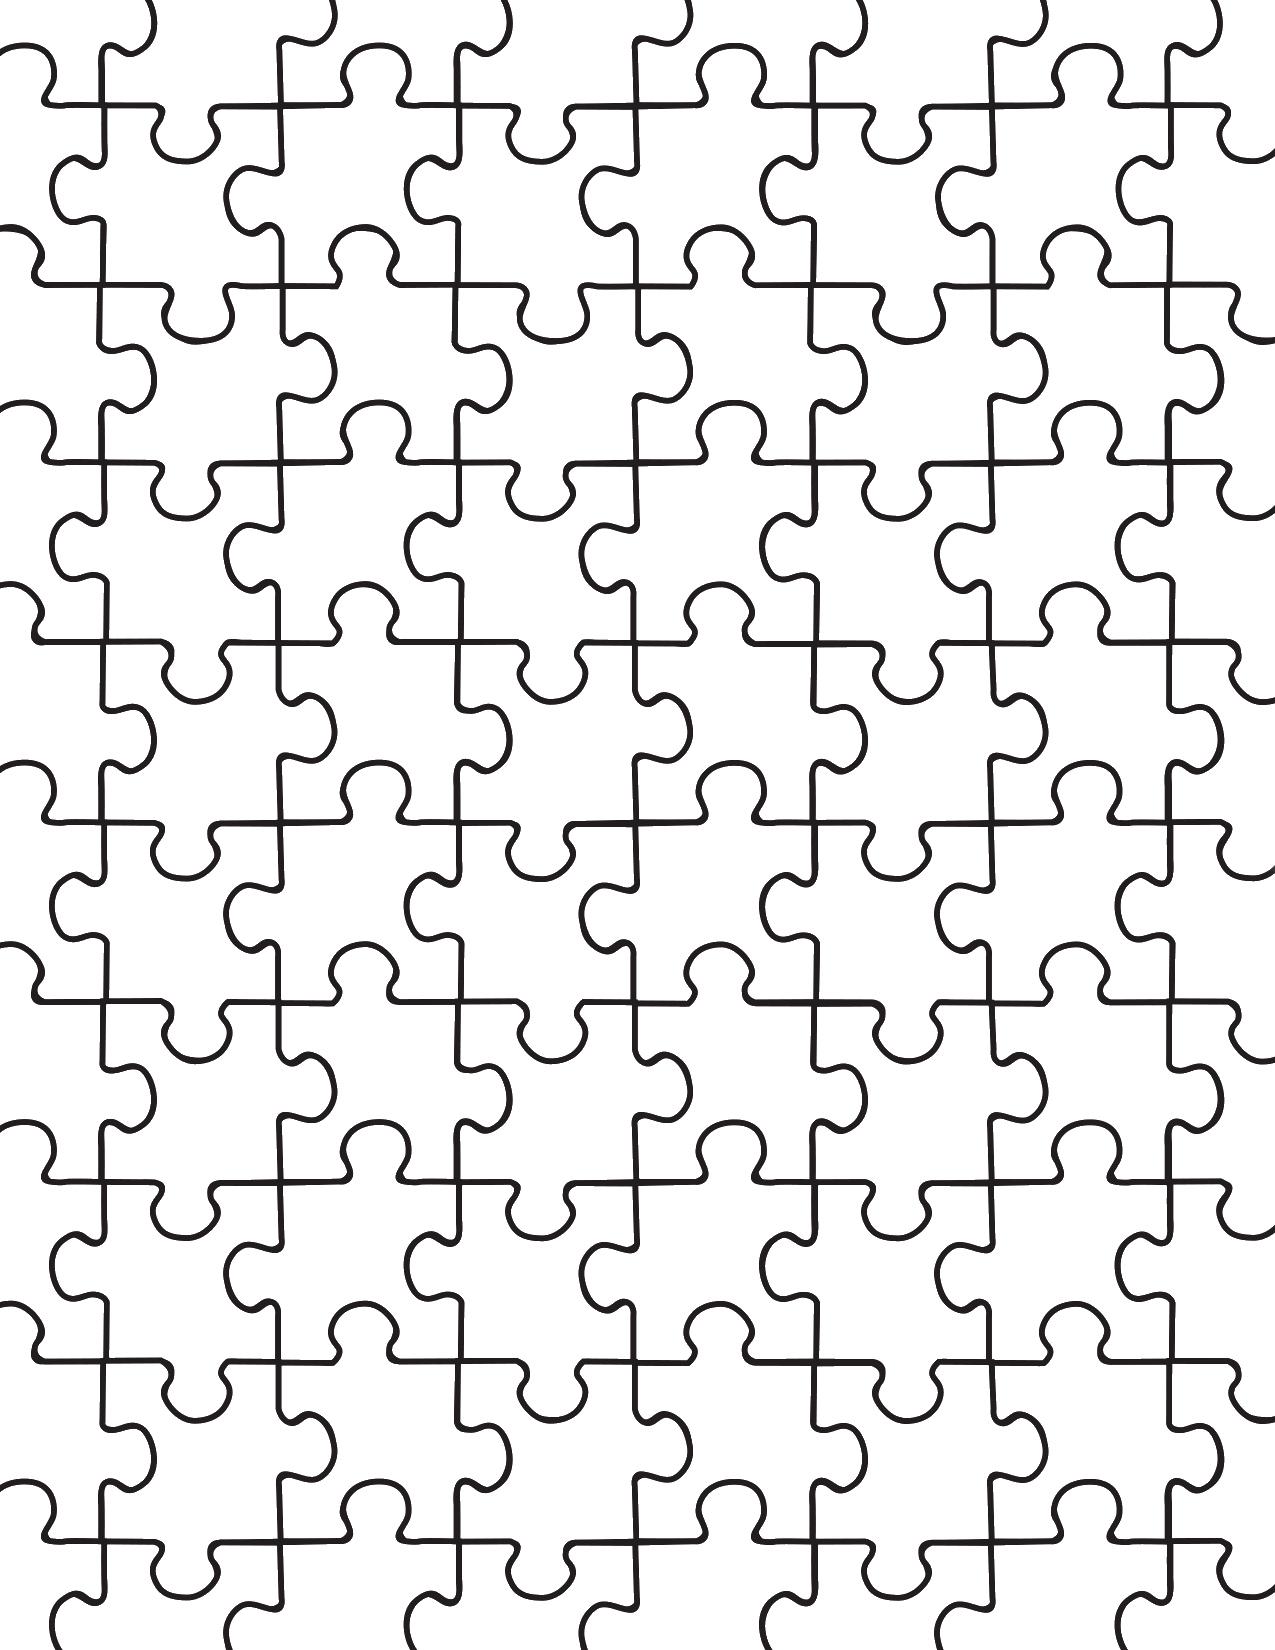 Printable Puzzle Pieces Template Elegant Printable Puzzle Pieces Template